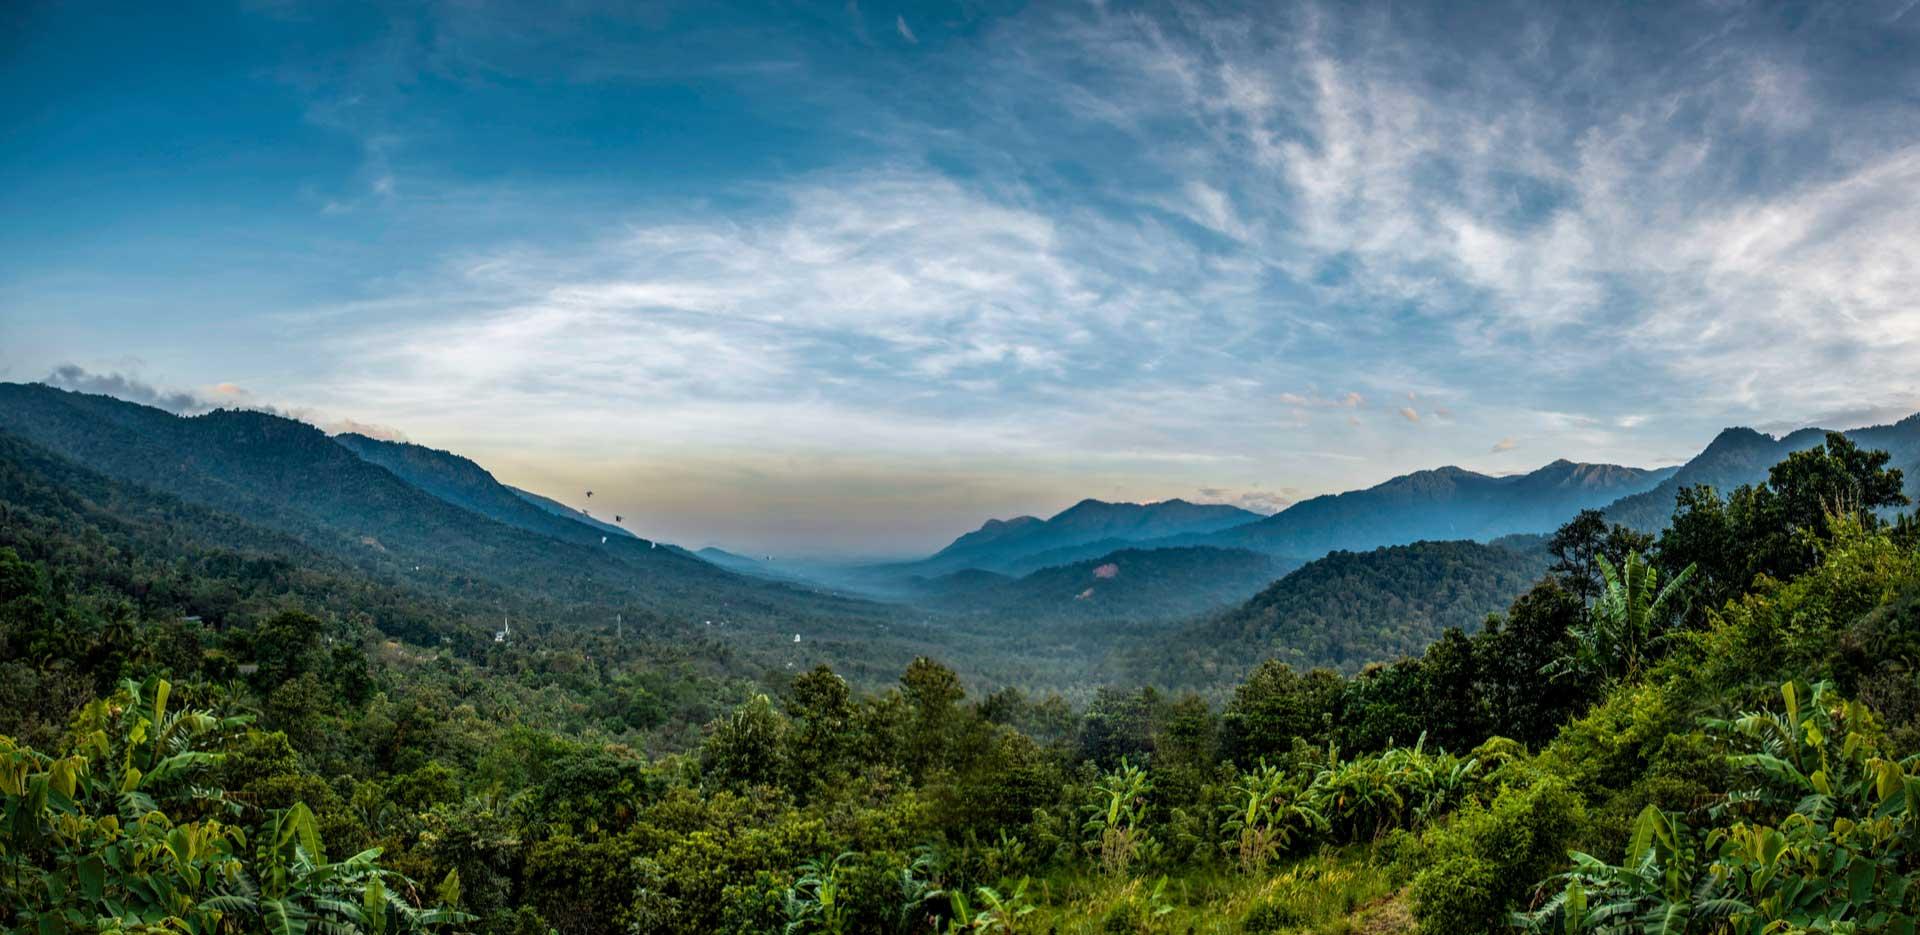 Serene South India - Bangalore, Mysore, Coorg And Waynad